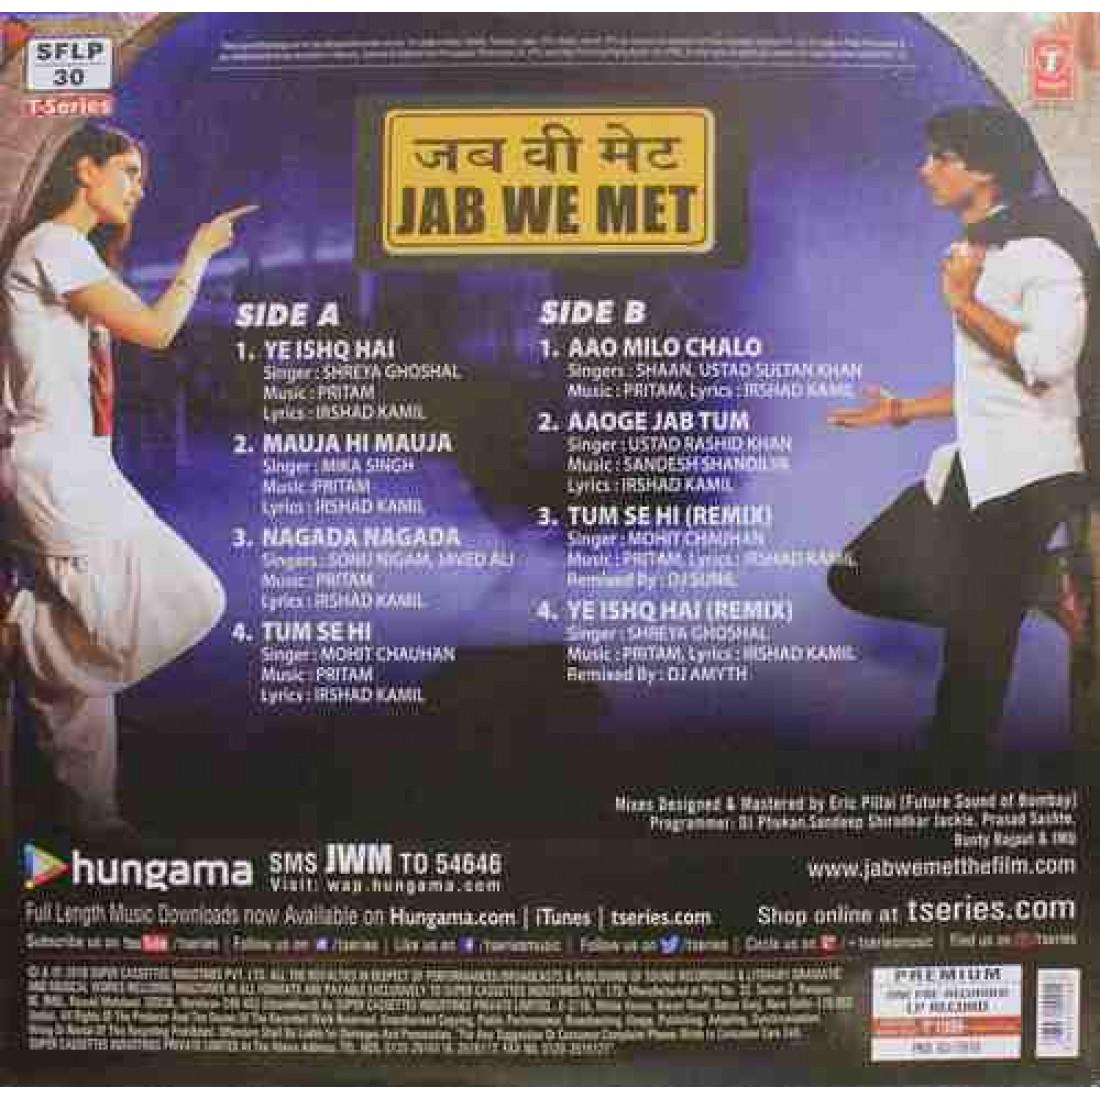 Jab We Met - SFLP 30 - LP Record